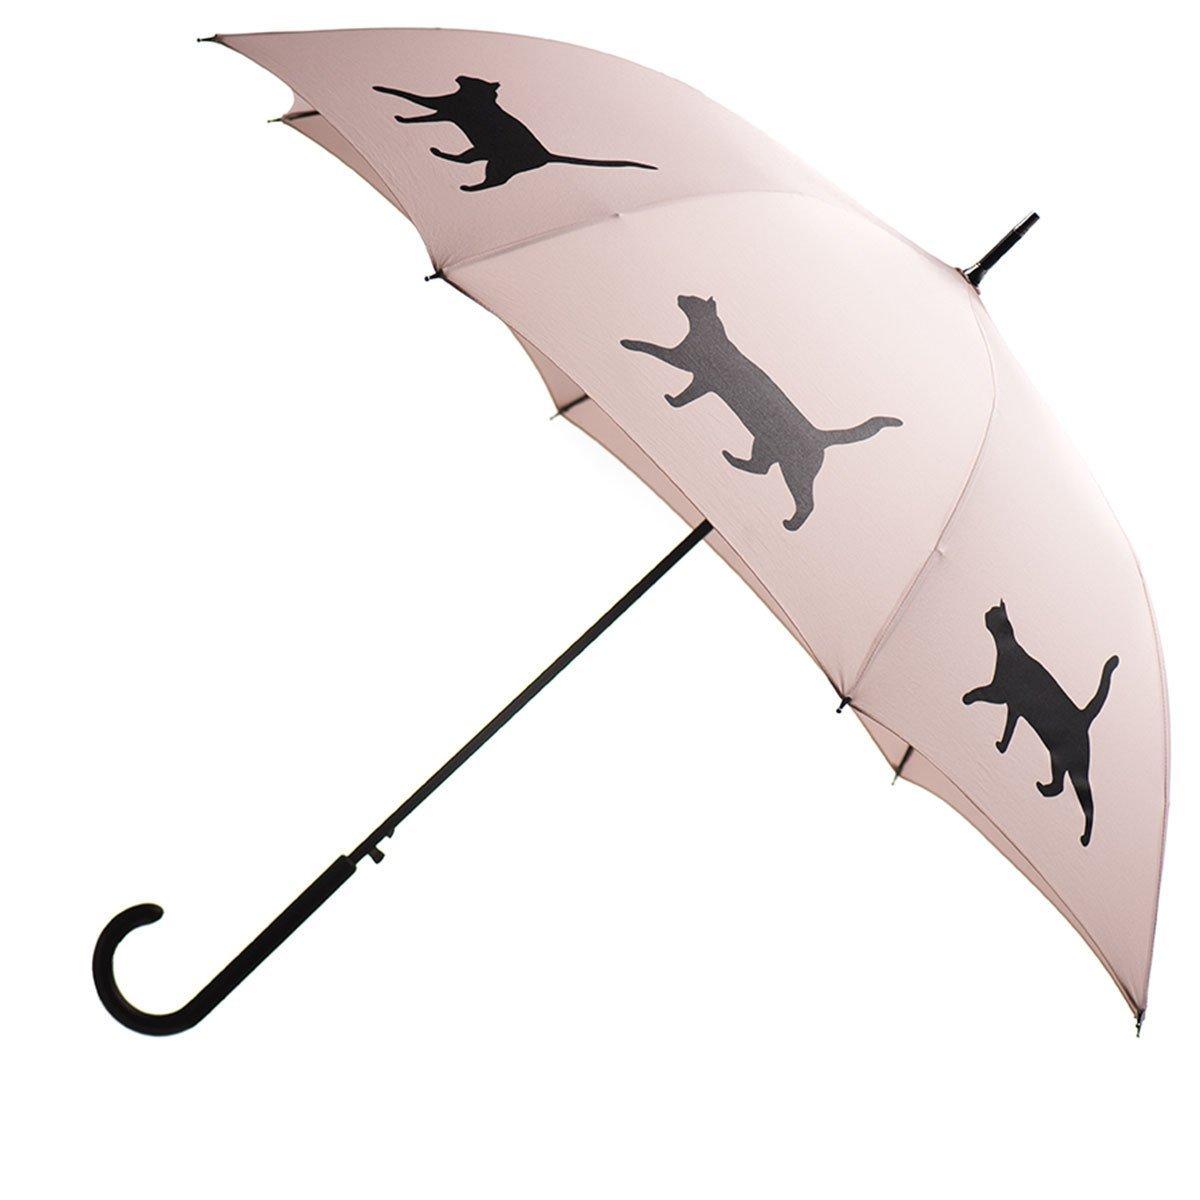 Cat Premium Rain Umbrella (Warm Taupe/Black) By San Francisco Umbrella Co.